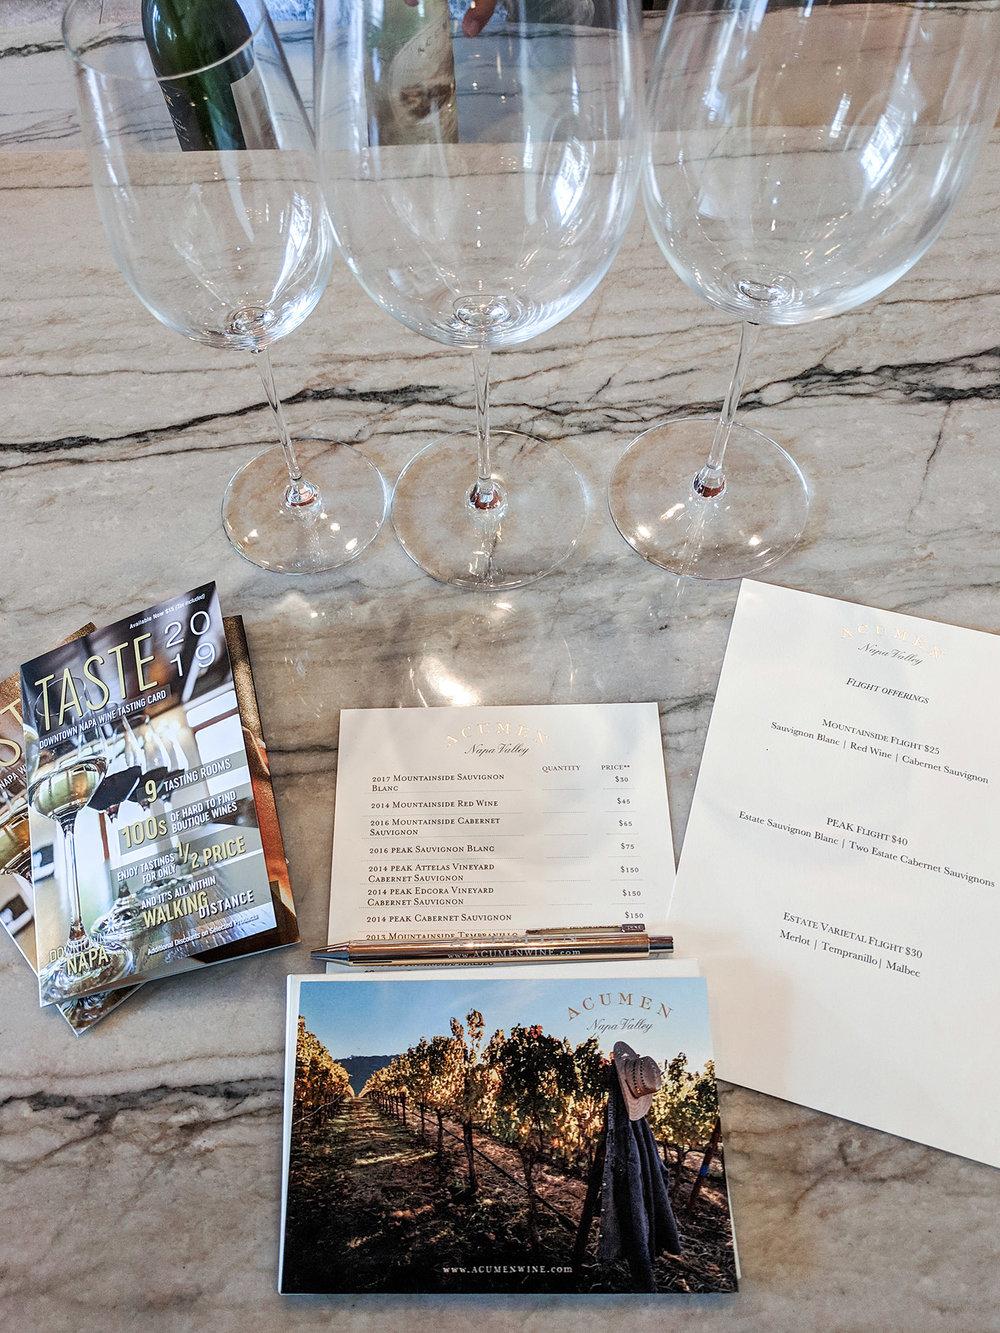 Acumen Wine Gallery tasting set up